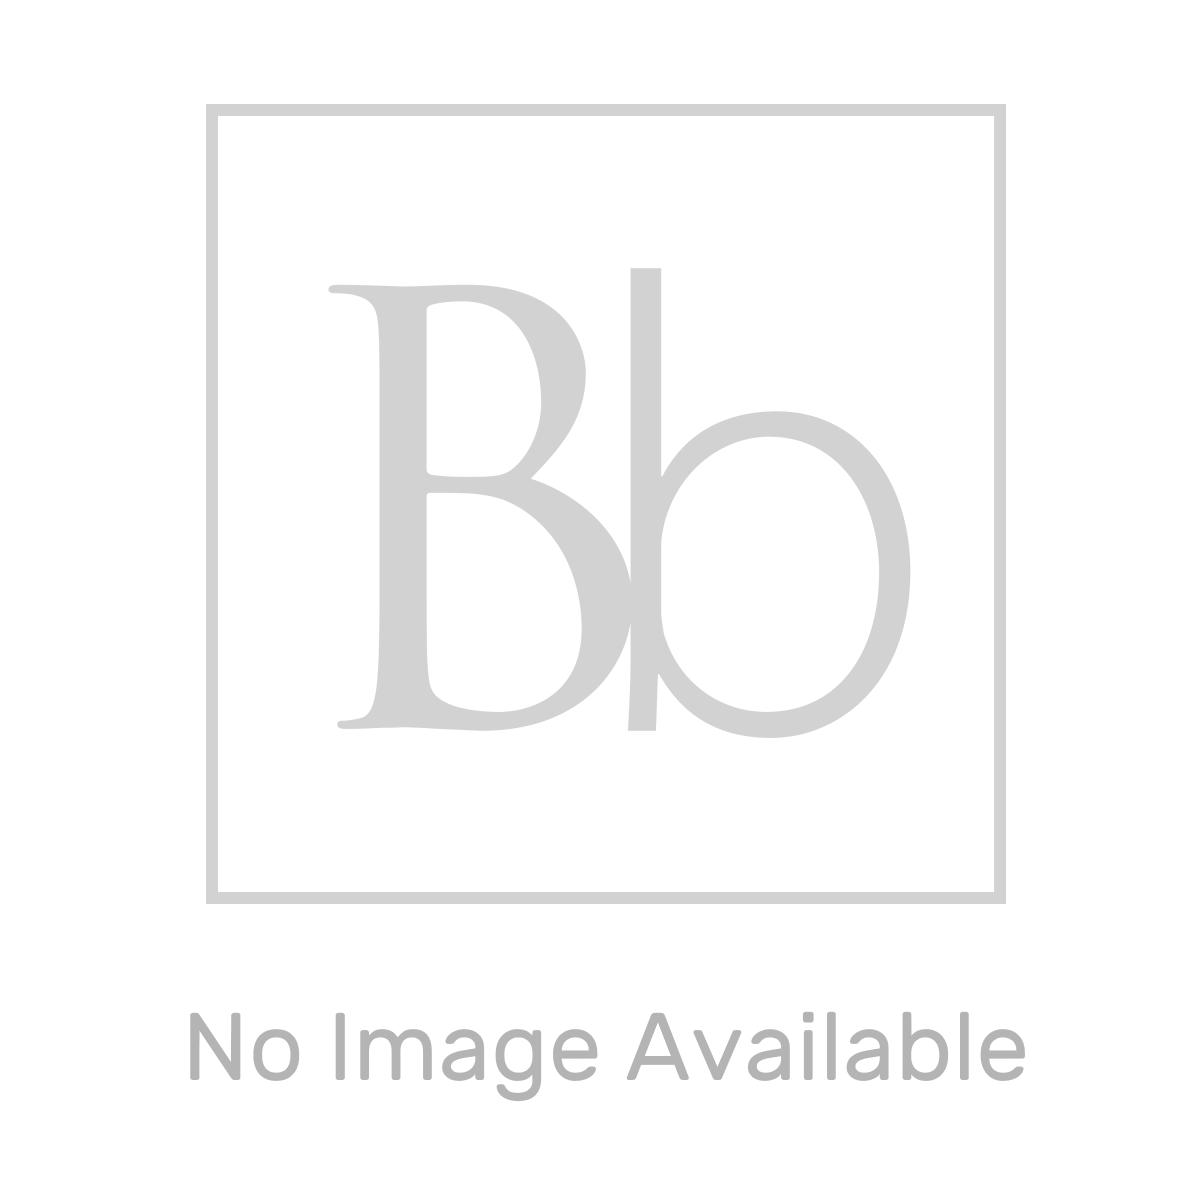 Merlyn Black Crittall Shower Screen